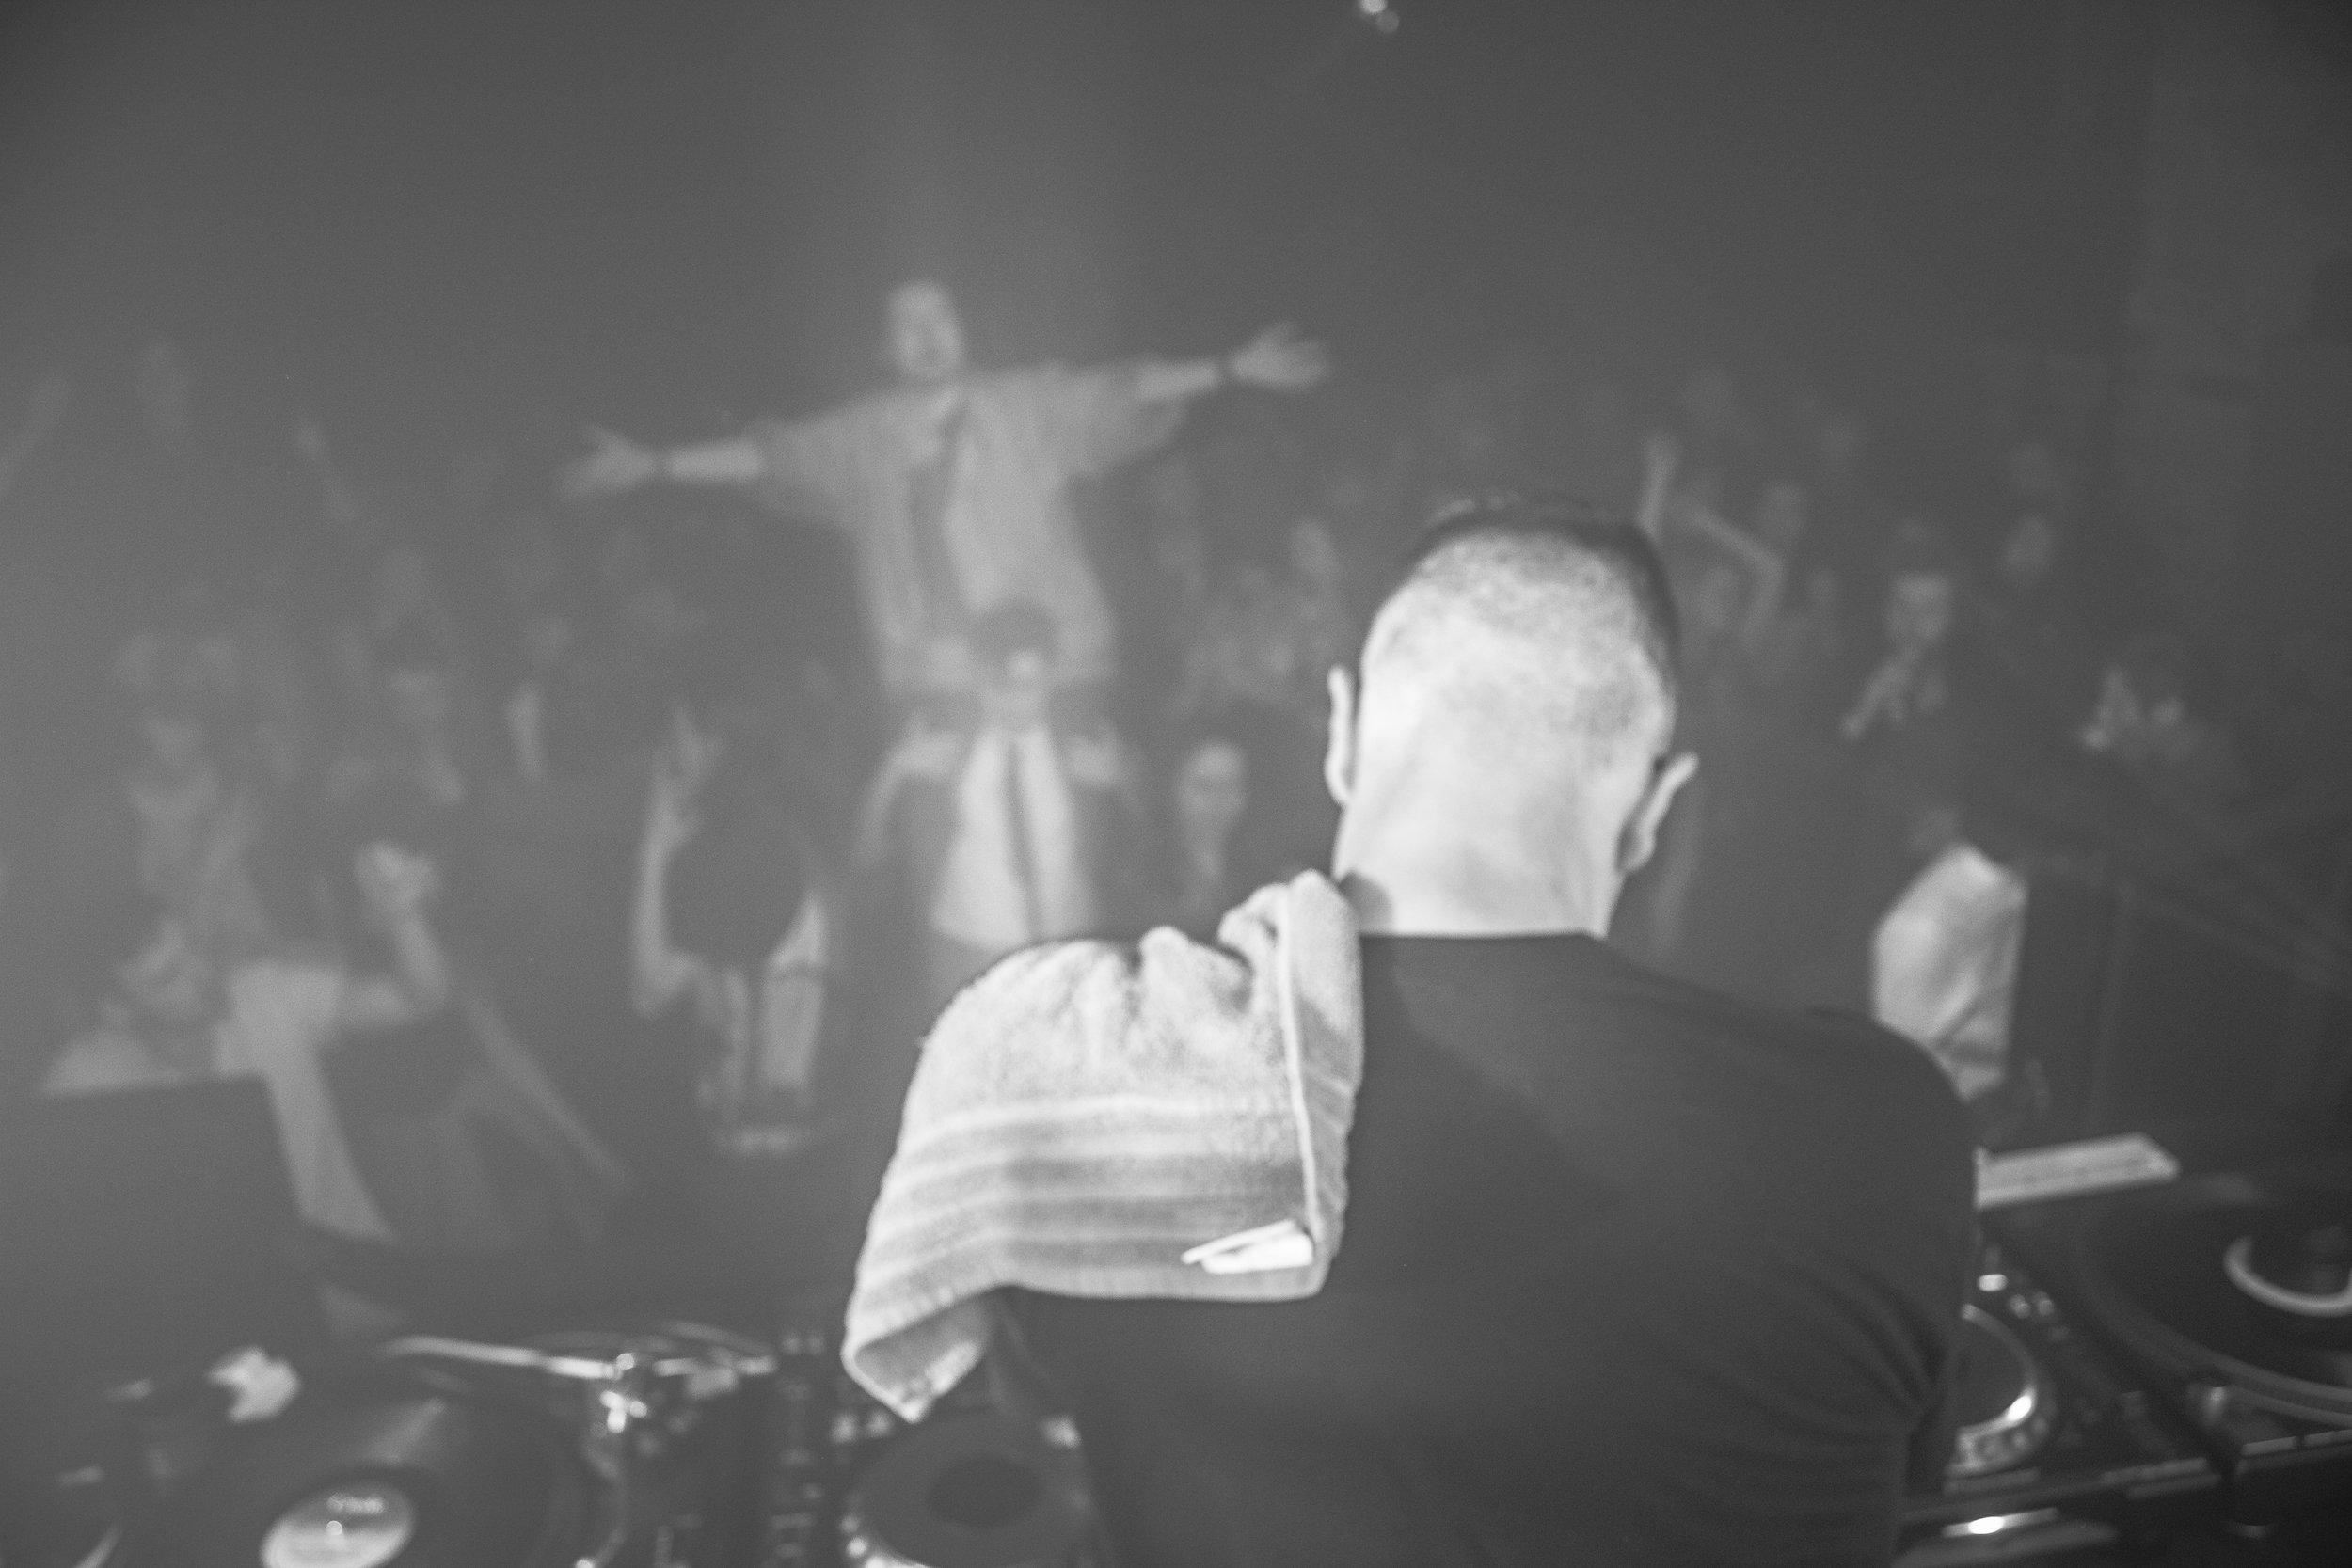 """Disco Towel"" Auto Disco by James O'Hara - Dundee, Scotland 2014"